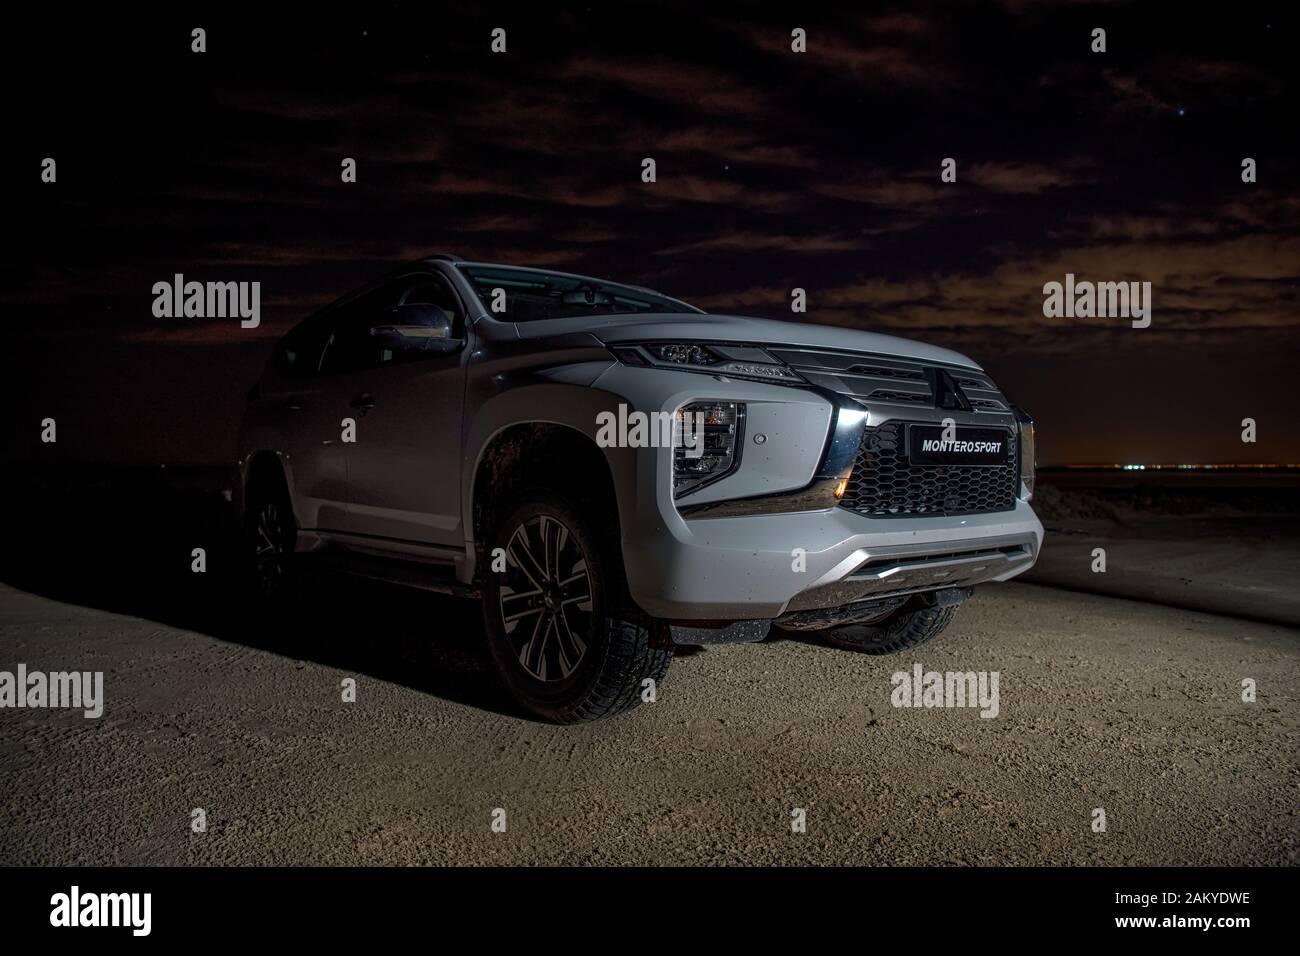 Mitsubishi Montero Sport Suv 4x4 Urban Vehicle Front View Camping In Desert Stock Photo Alamy